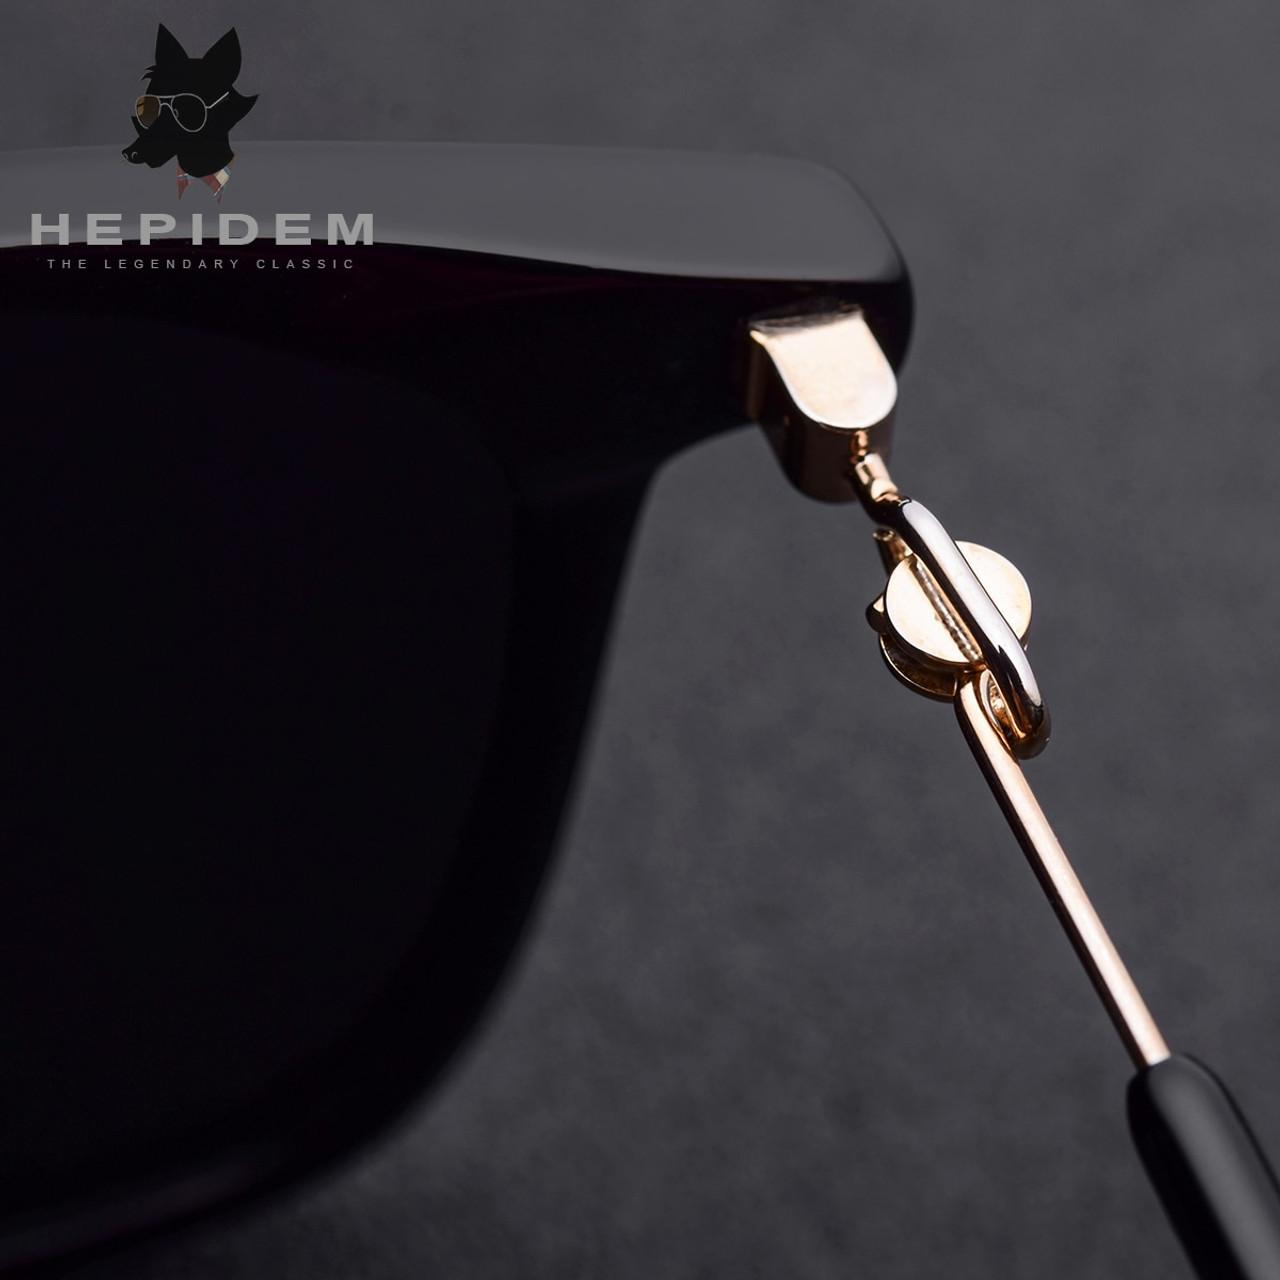 672f4fb37a3 ... Acetate Sunglasses Men Polarized Brand Designer 2018 New Fashion d  Squared Mirror Korean Sun Glasses for ...